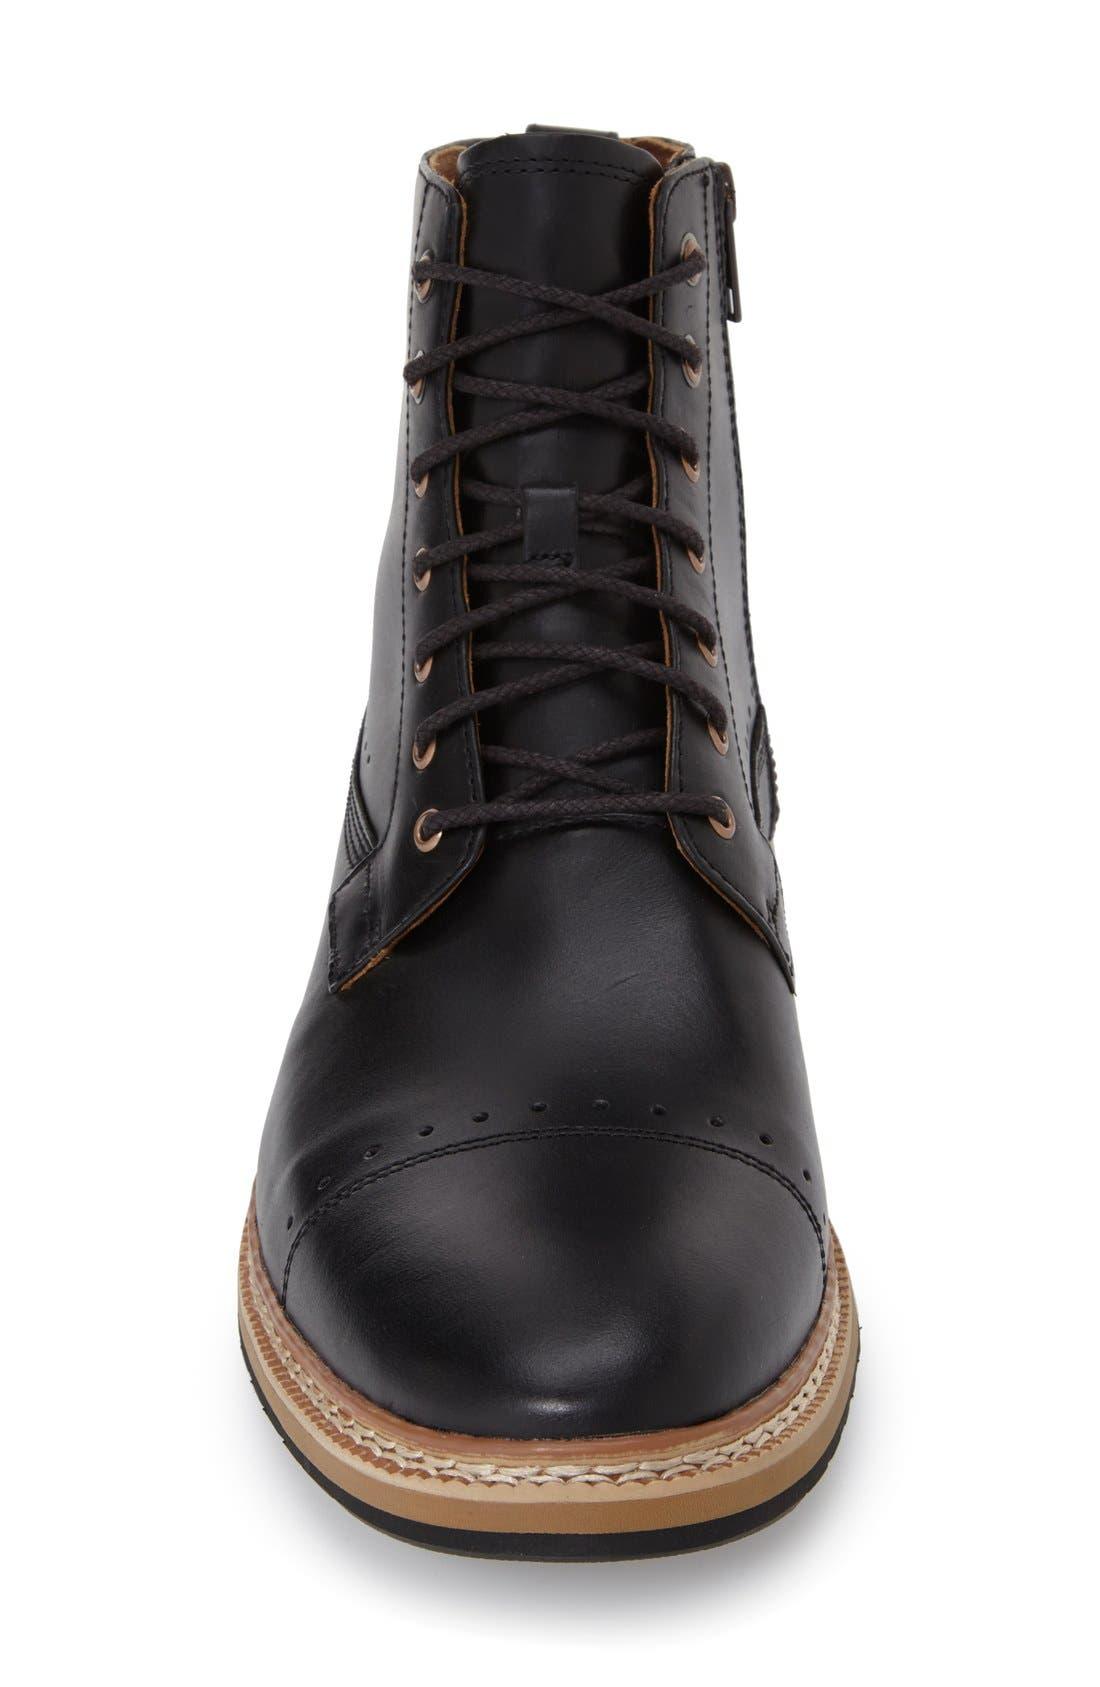 'Westhaven' Cap Toe Boot,                             Alternate thumbnail 3, color,                             BLACK LEATHER